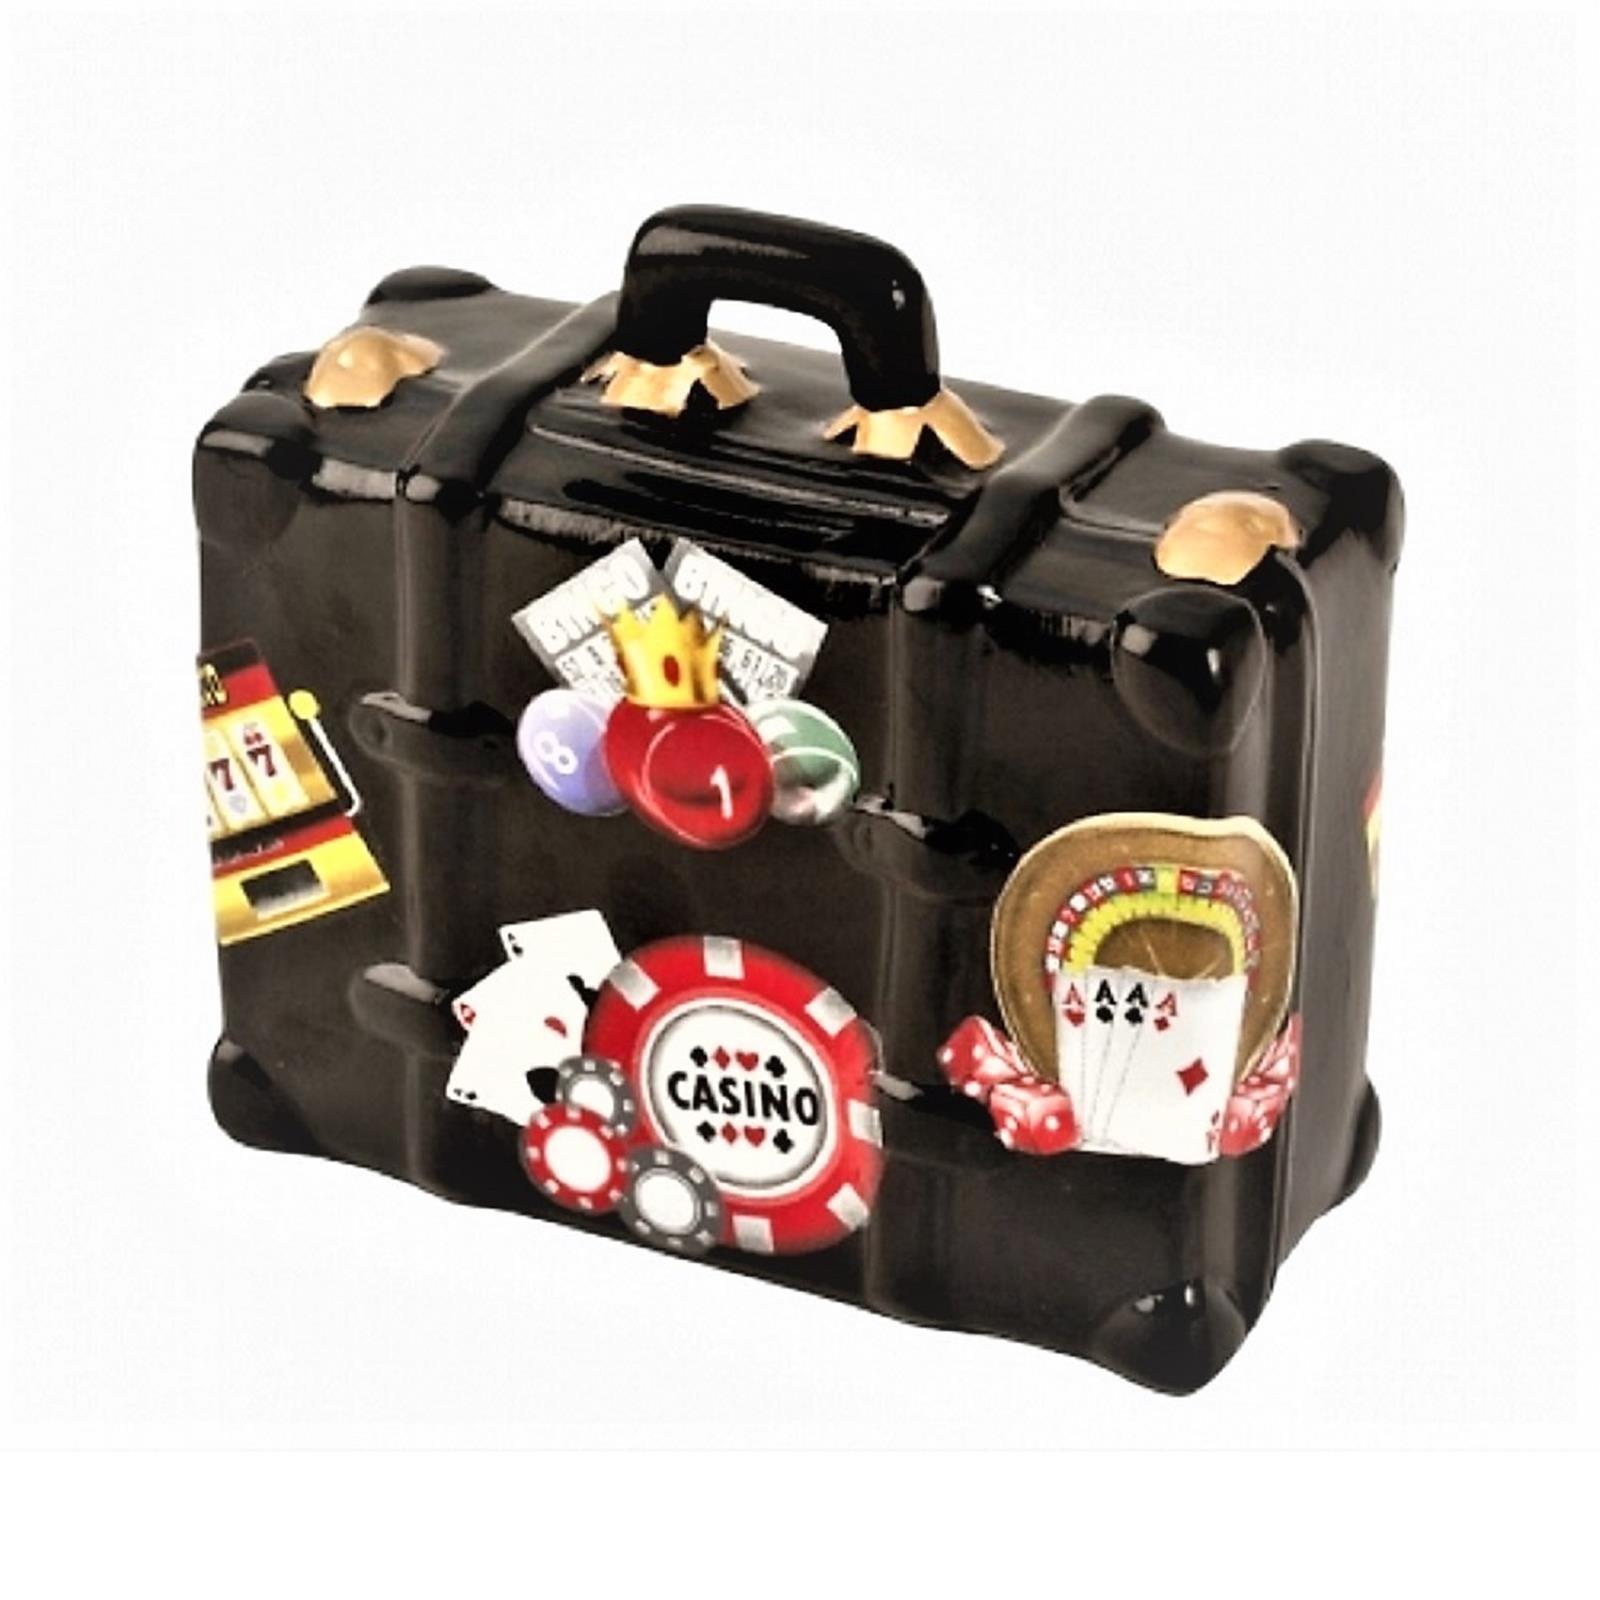 Spardose Koffer Casino